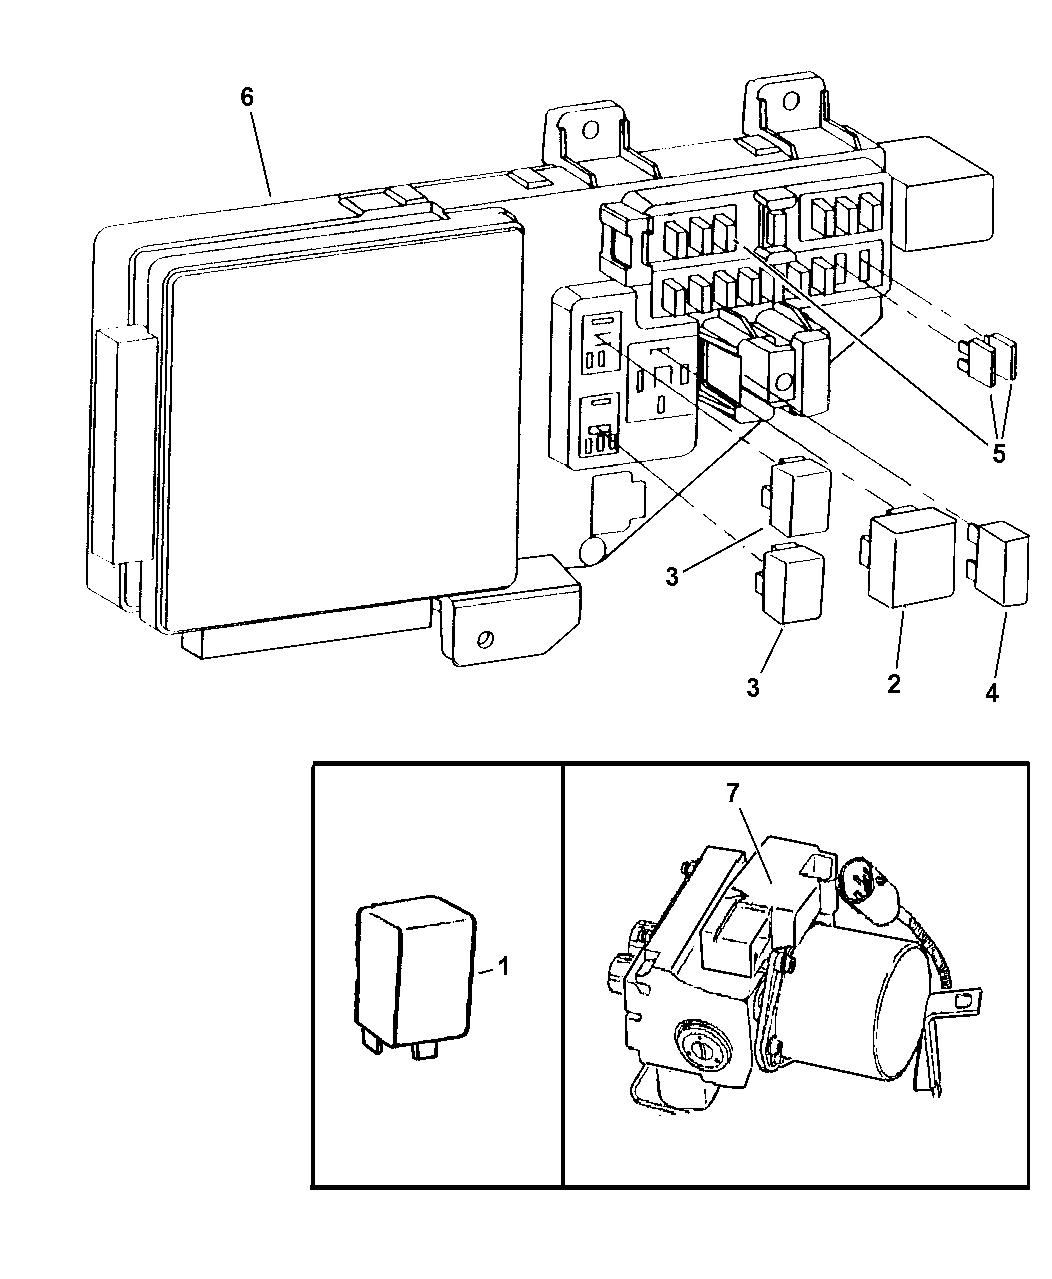 1999 Chrysler Sebring Convertible Relays Mopar Parts Giant Distribution Fuse Box Diagram